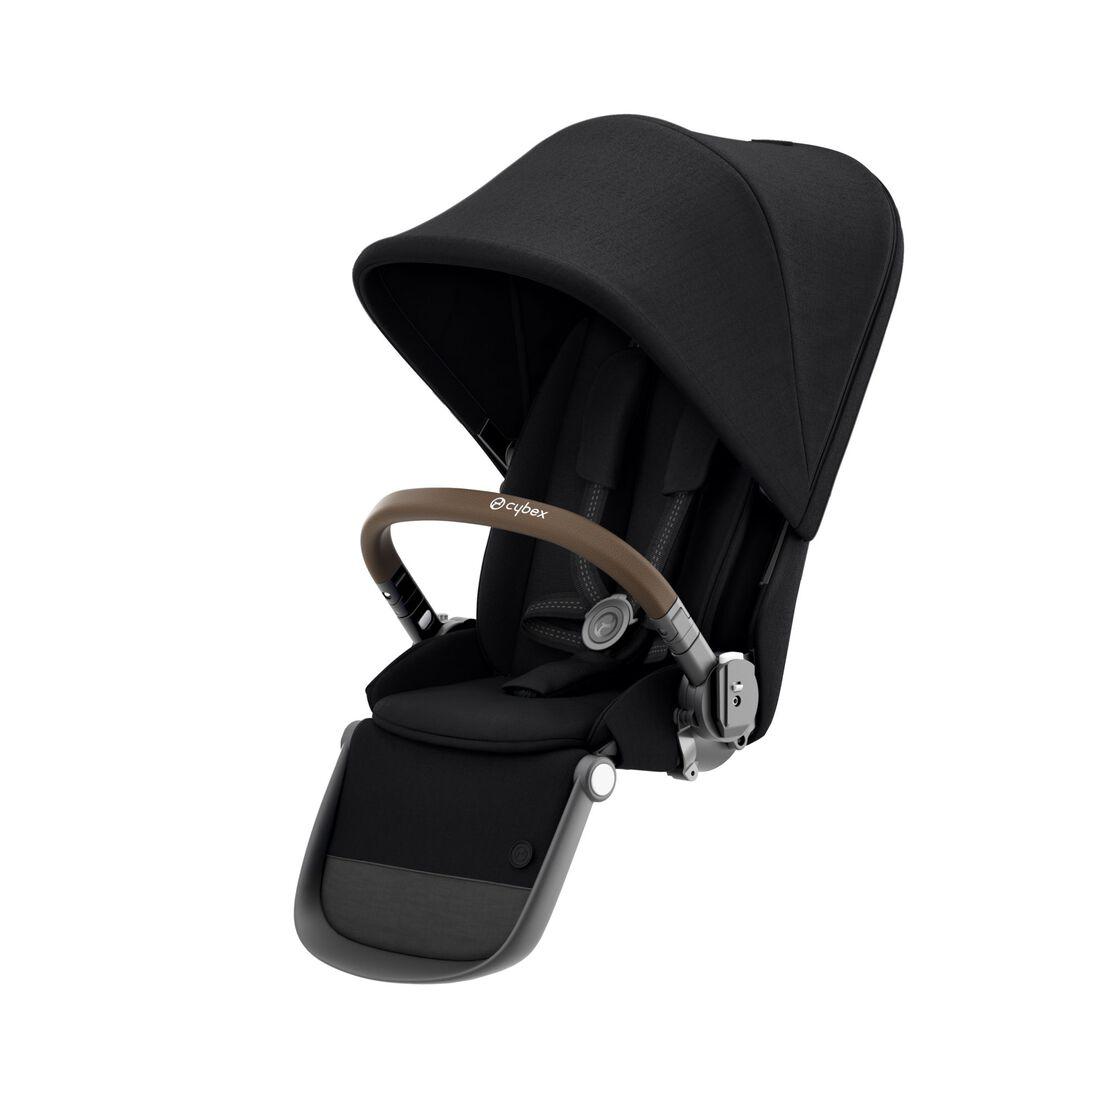 CYBEX Gazelle S Sitzeinheit - Deep Black (Taupe Frame) in Deep Black (Taupe Frame) large Bild 1